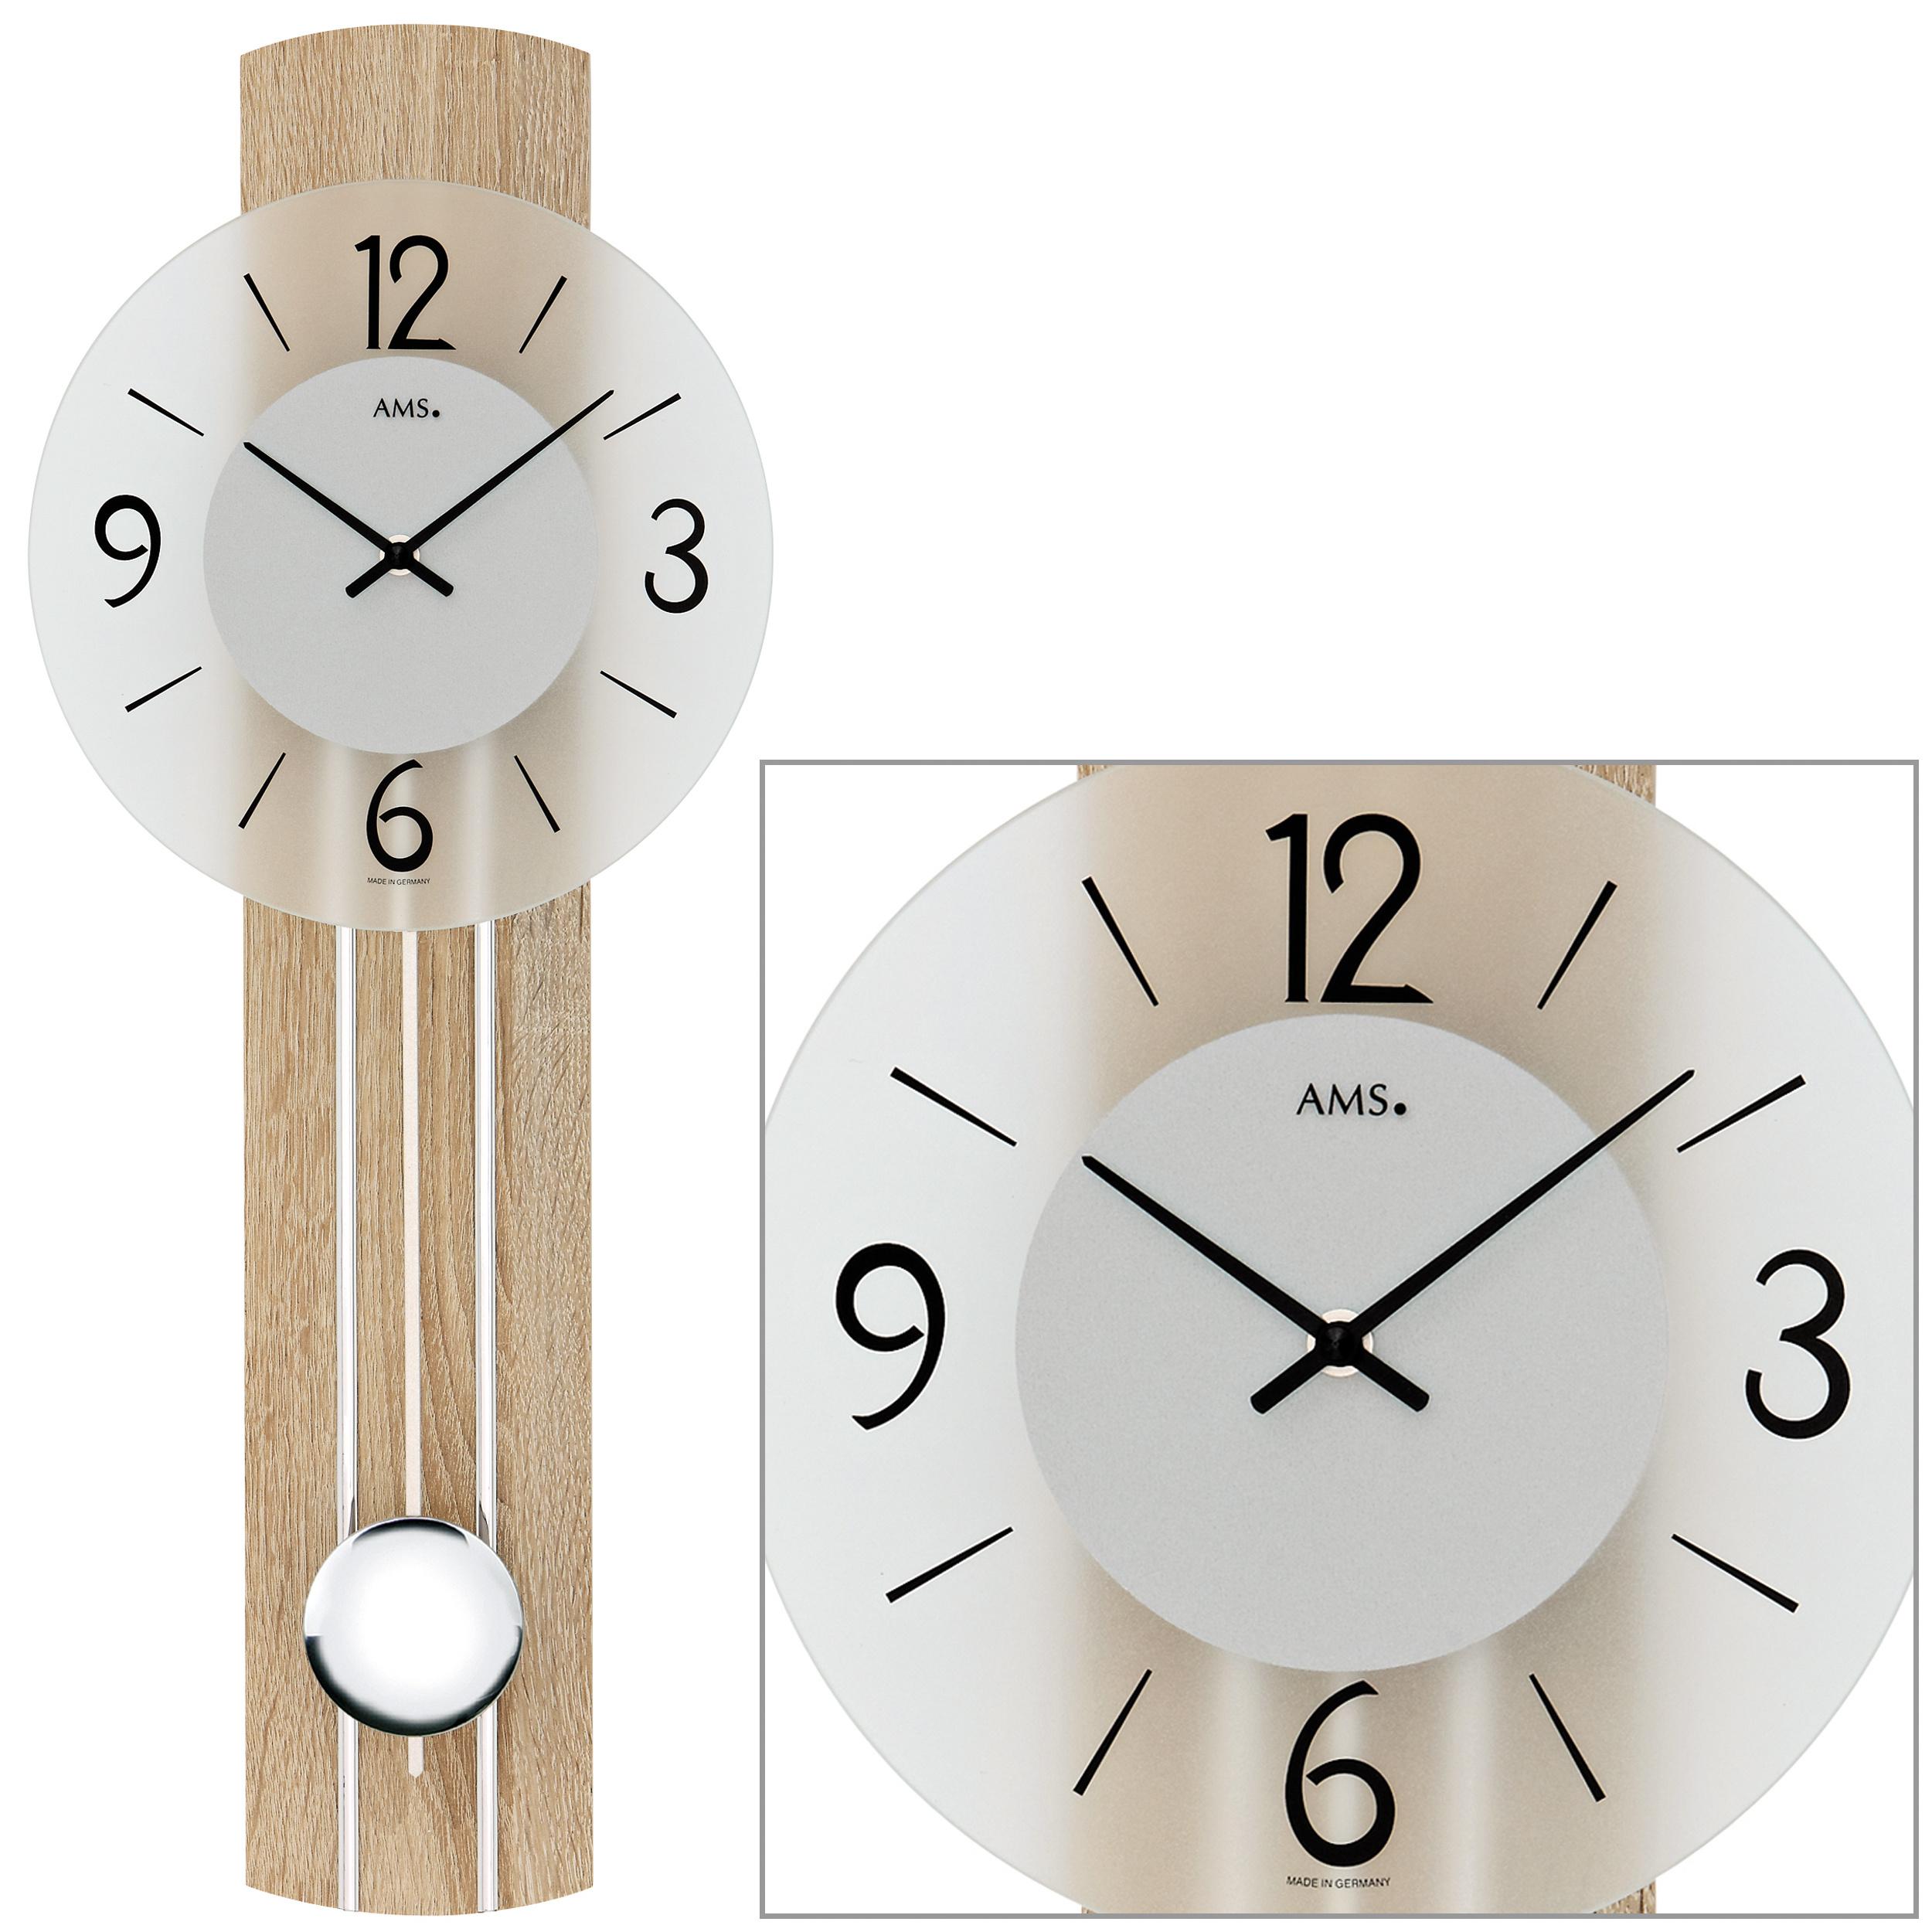 Details Zu Ams 7274 Wanduhr Quarz Mit Pendel Holz Sonoma Optik Pendeluhr